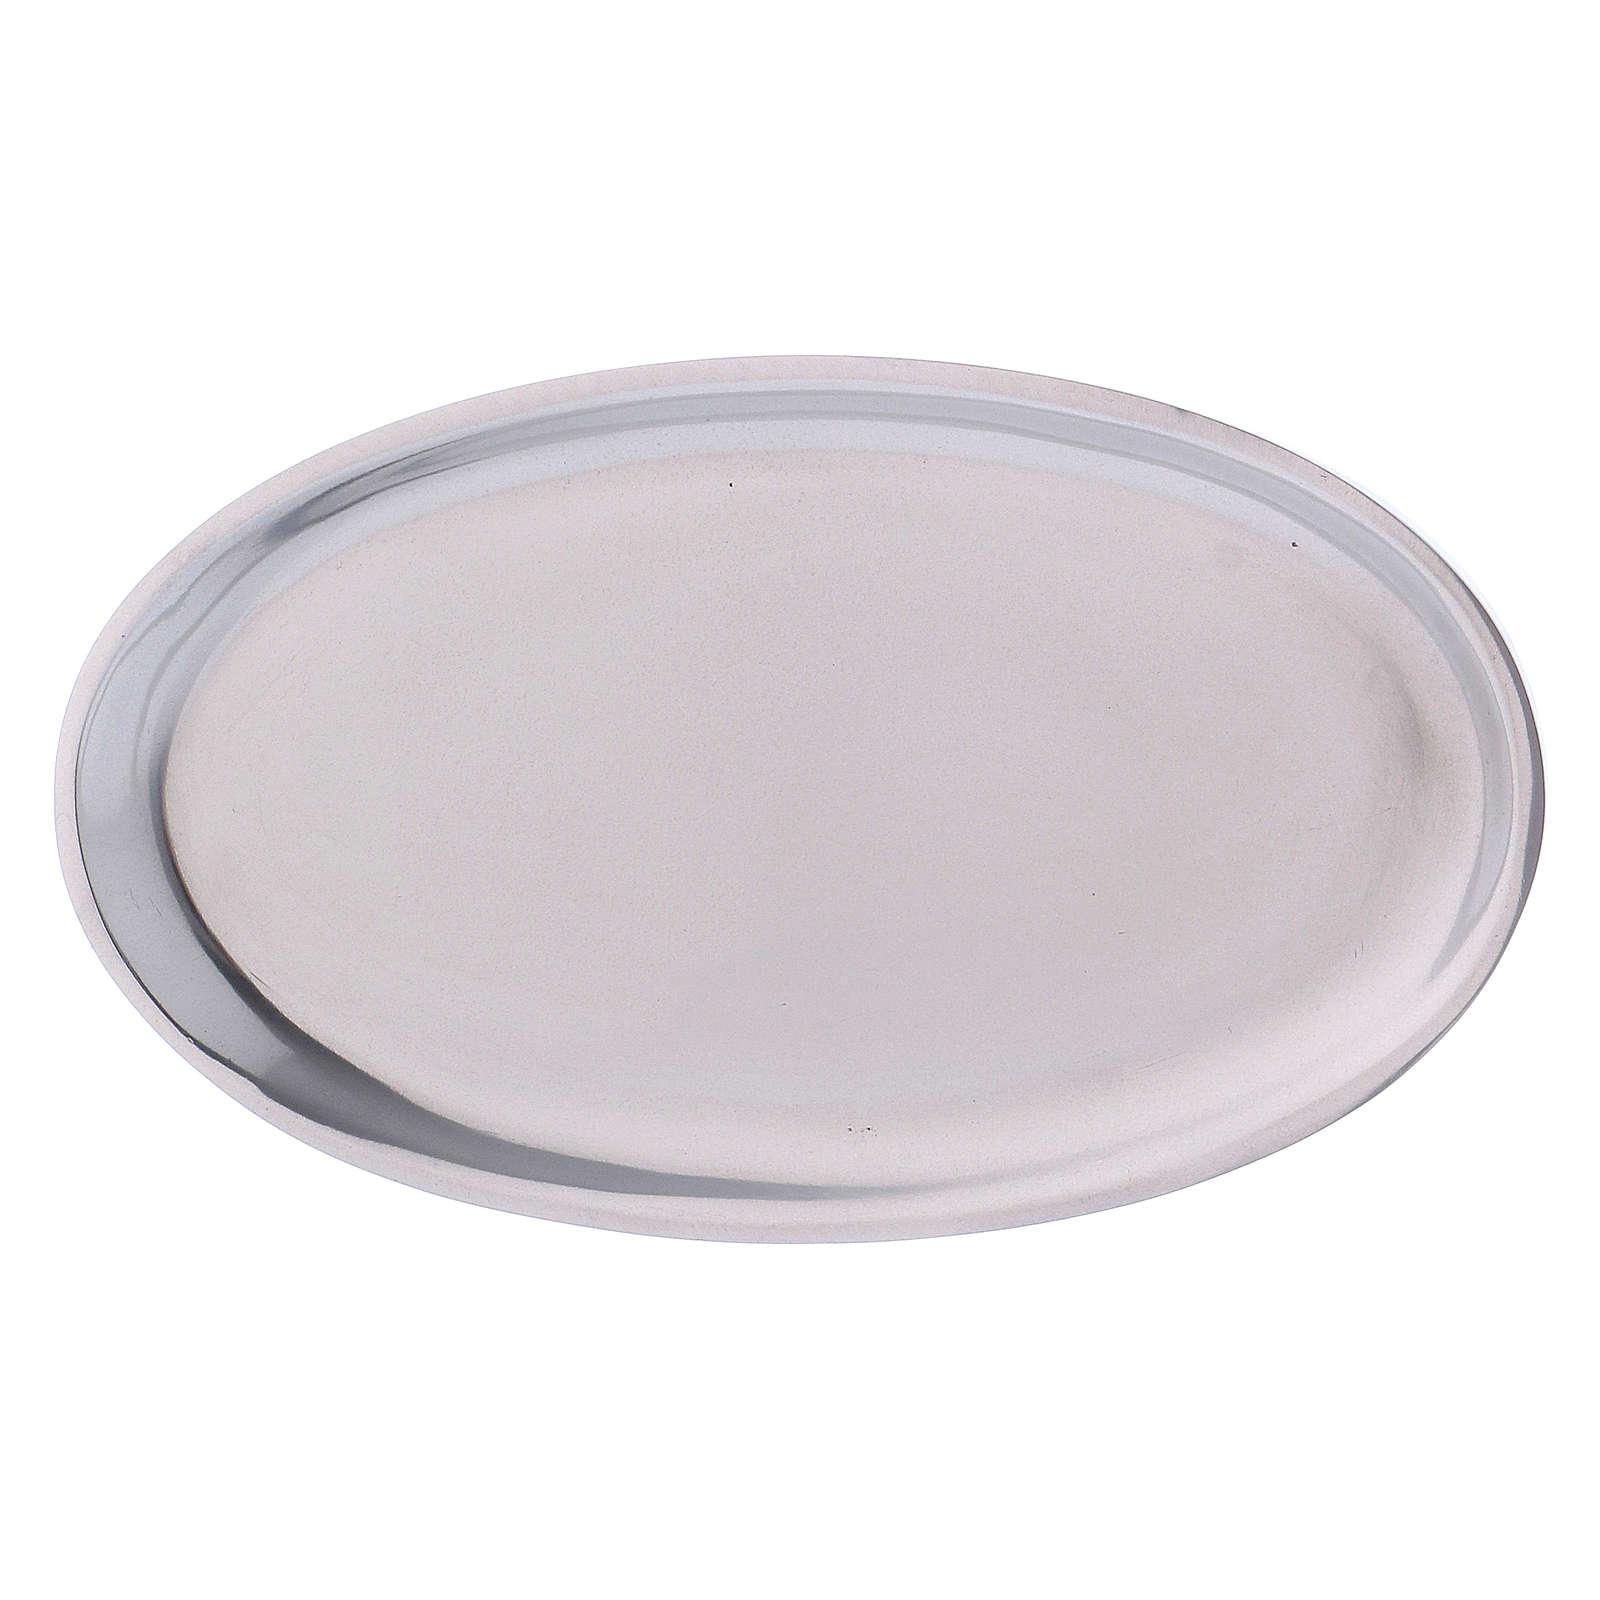 Portacandele in alluminio lucidato ovale 3